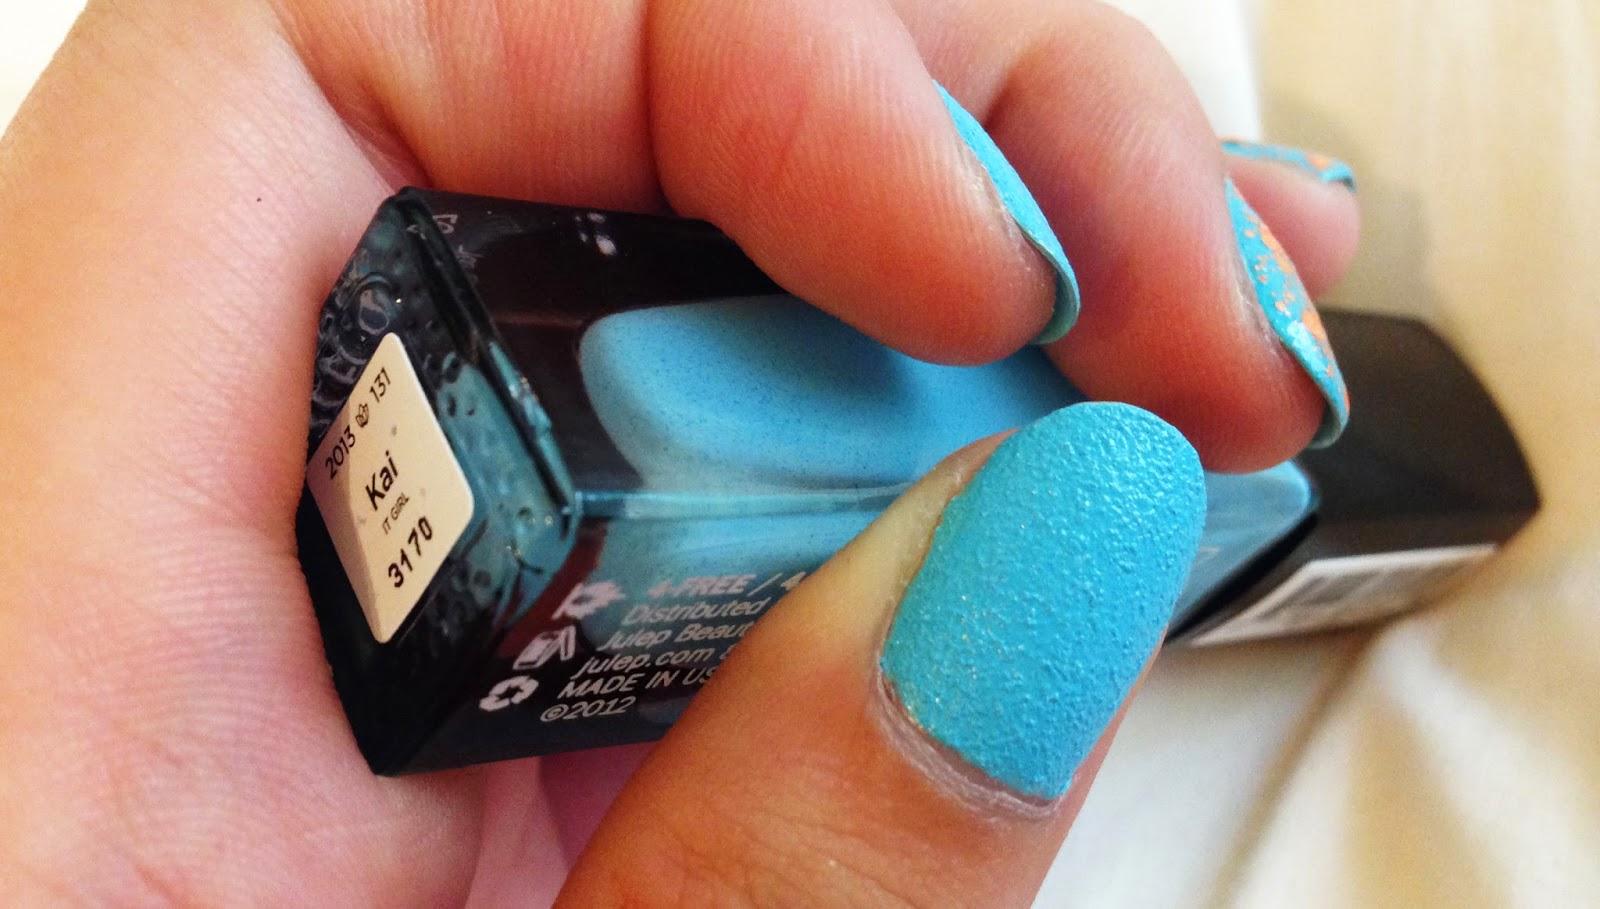 lovelifeoutloud: Nails of the Week #13: Julep in Kai & Sephora ...